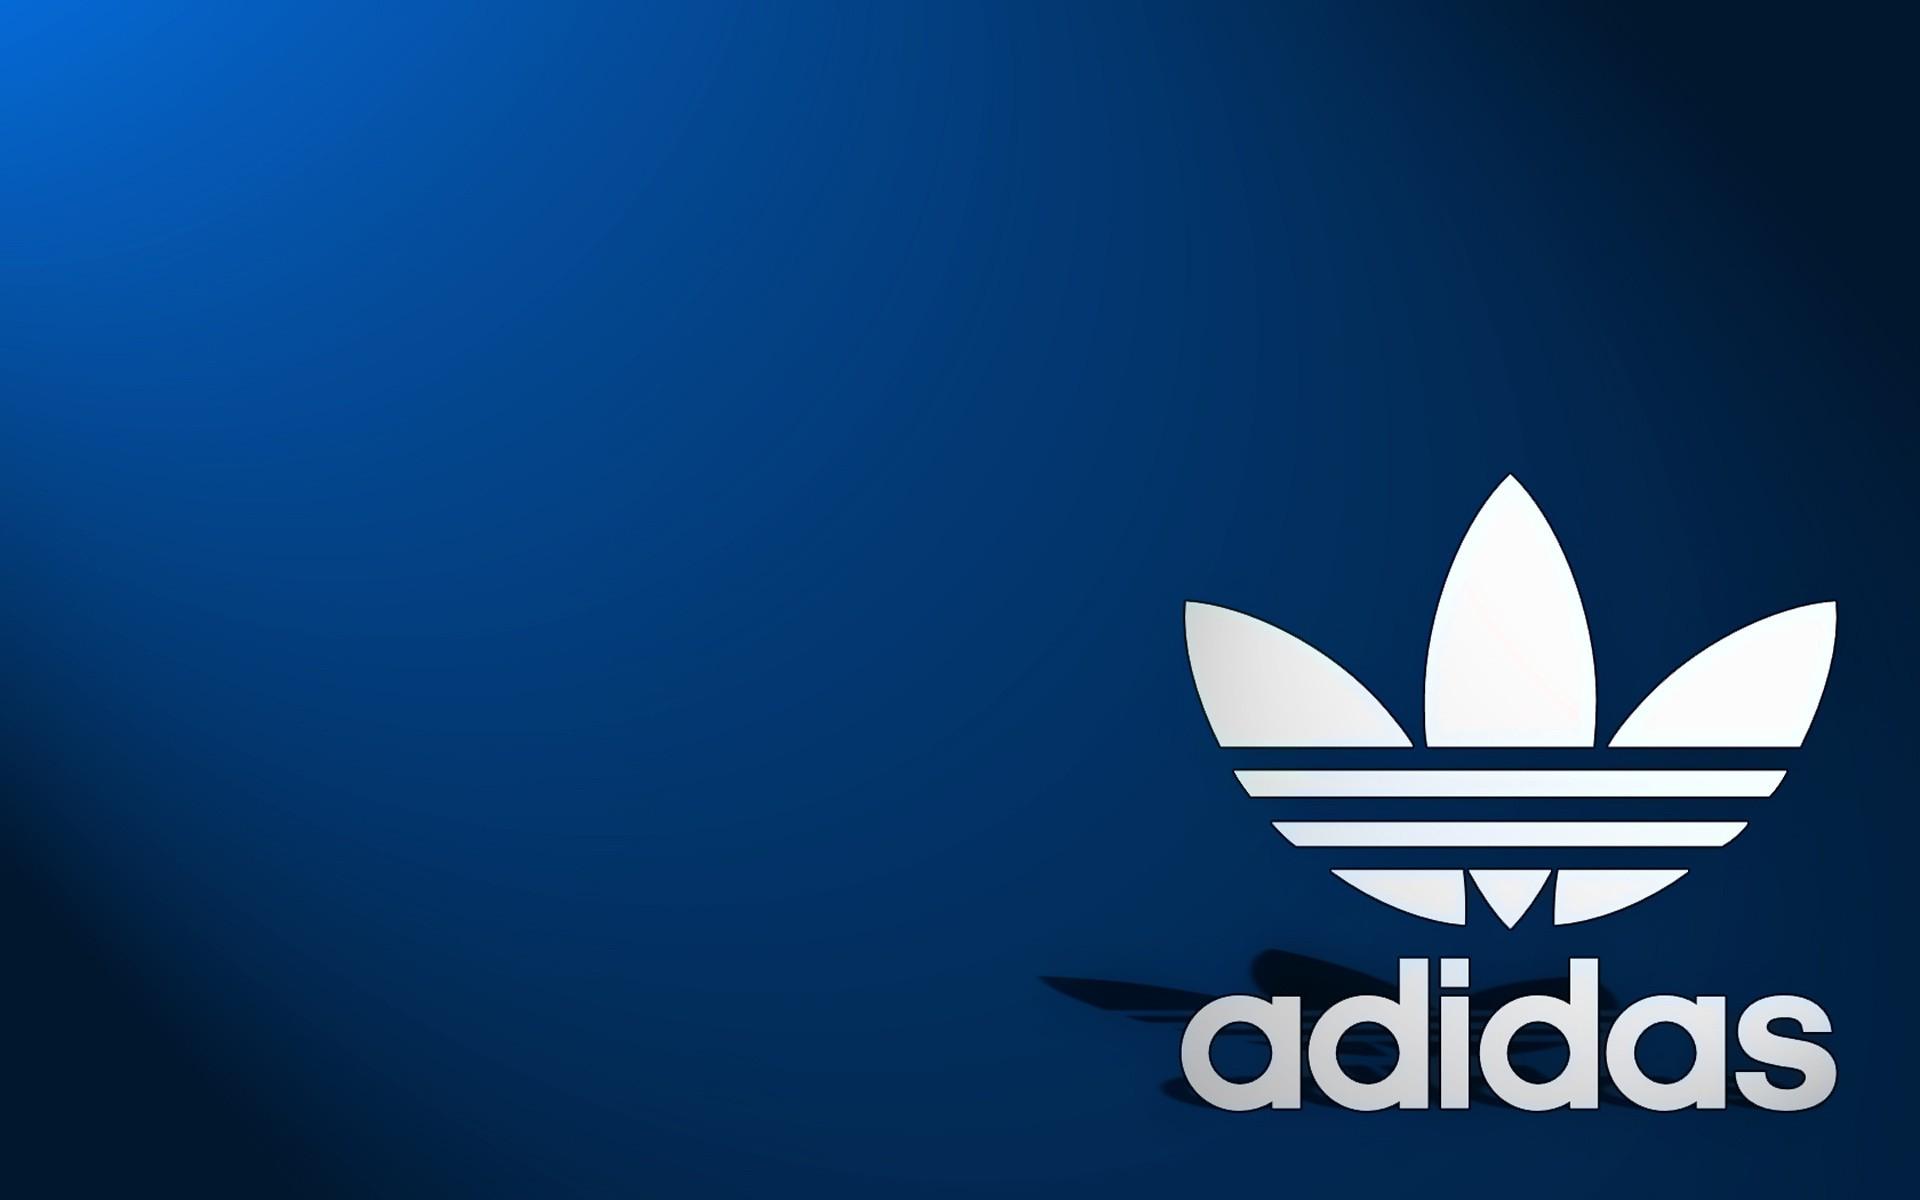 Sports logo wallpaper wallpapersafari download sports adidas wallpaper 1920x1200 wallpoper 408184 voltagebd Gallery